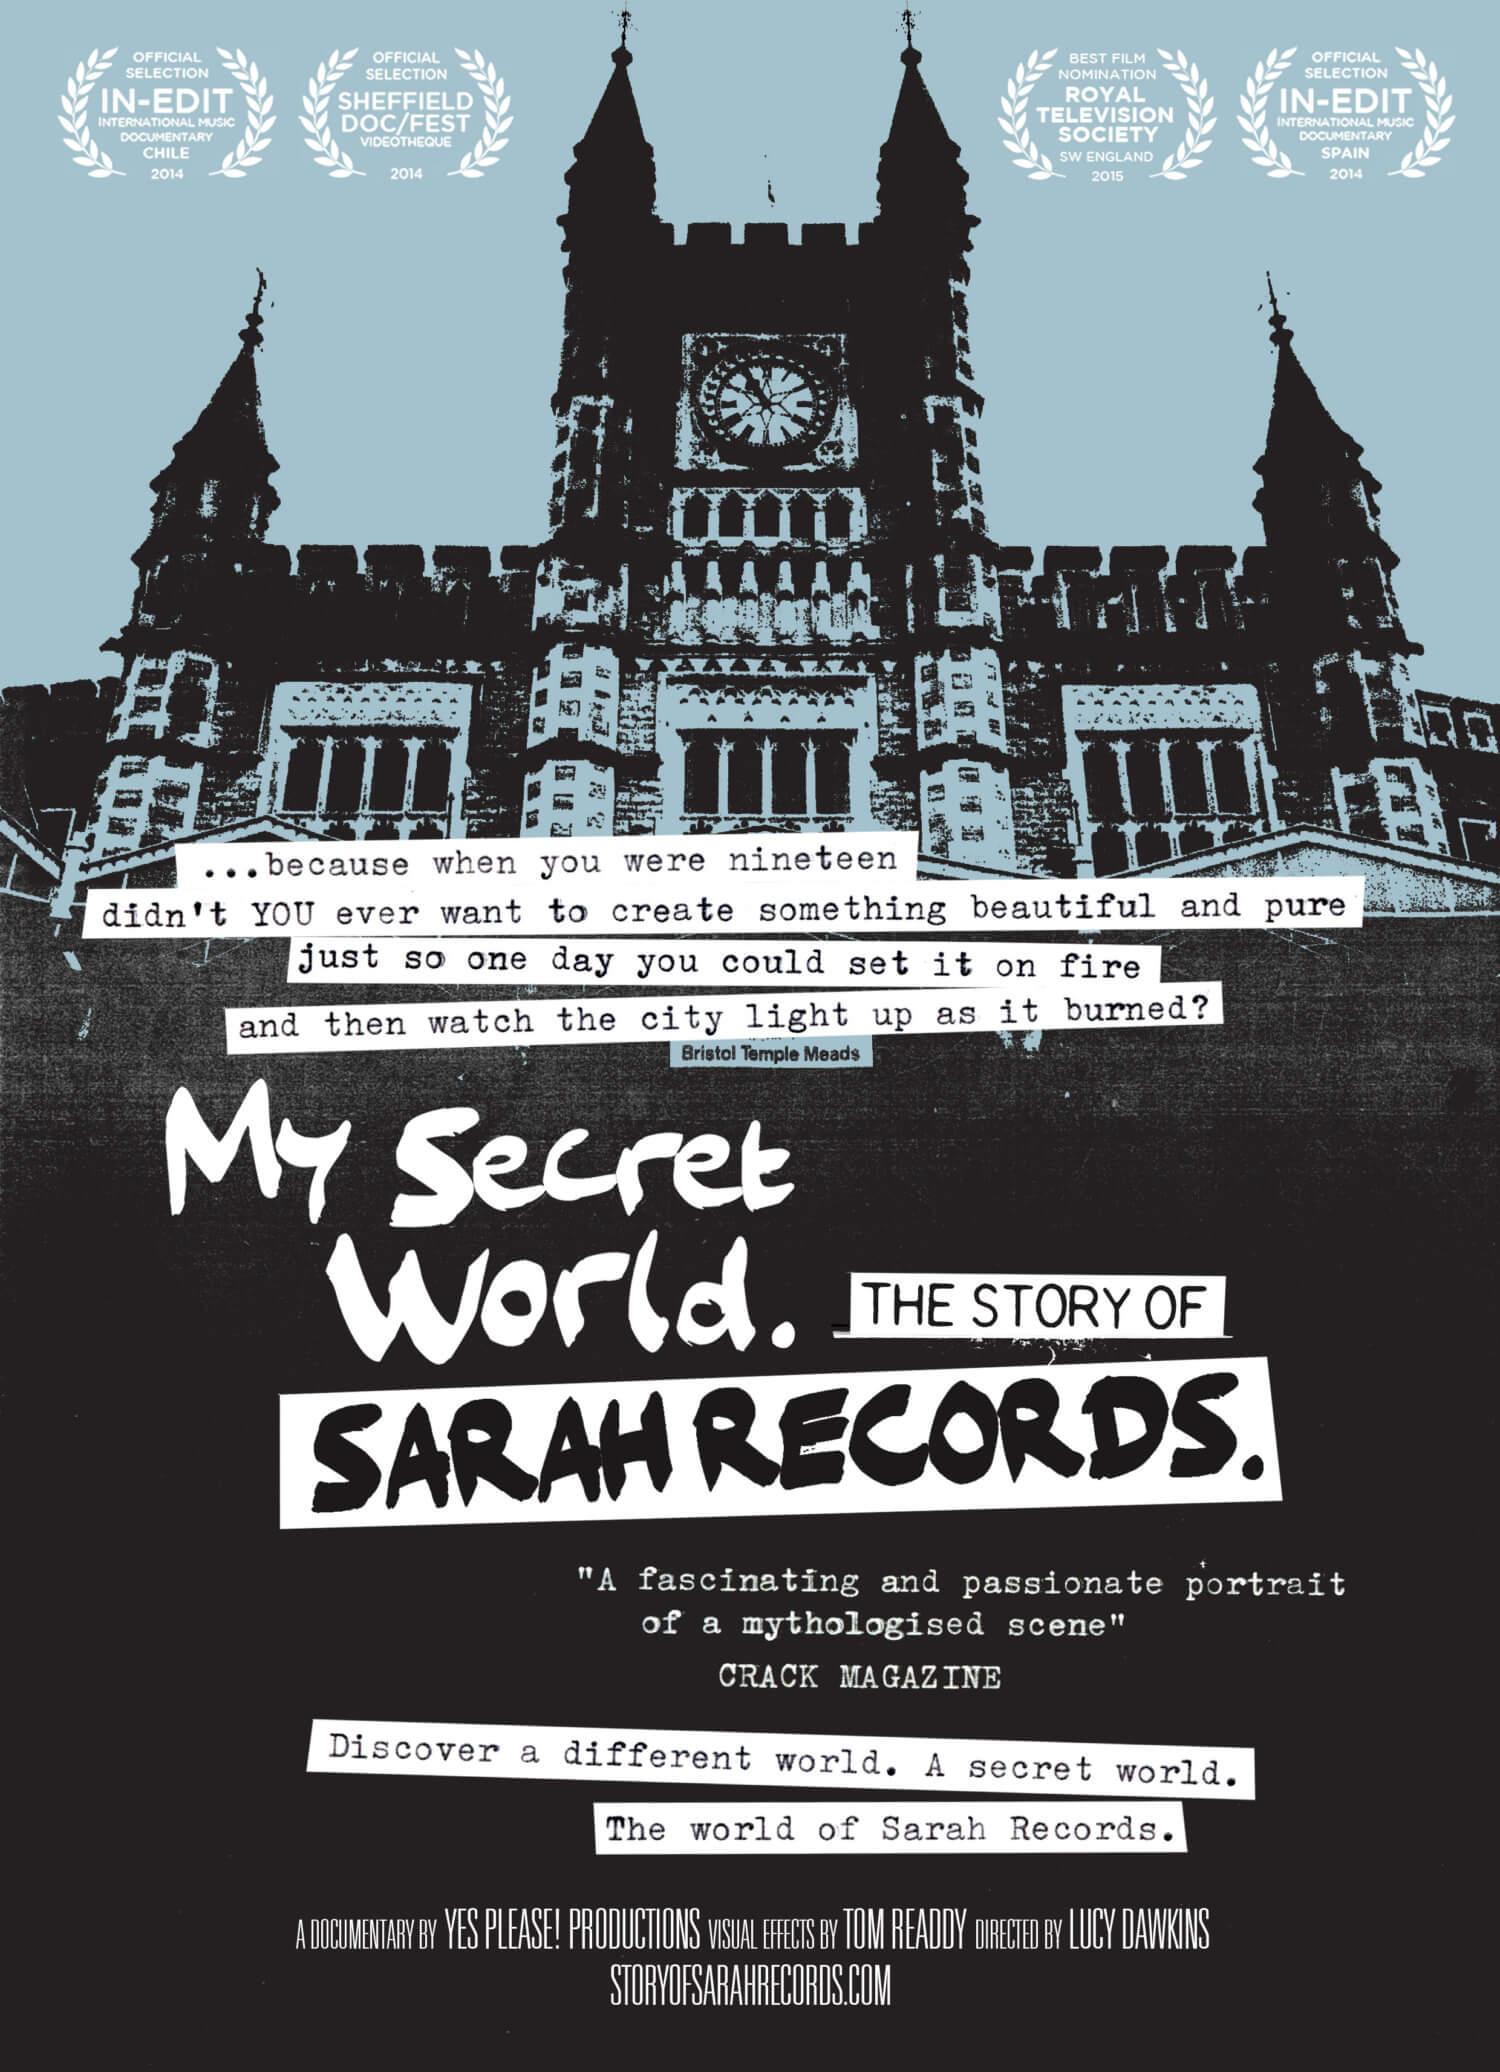 My Secret World: The Story of Sarah Recordsポスター